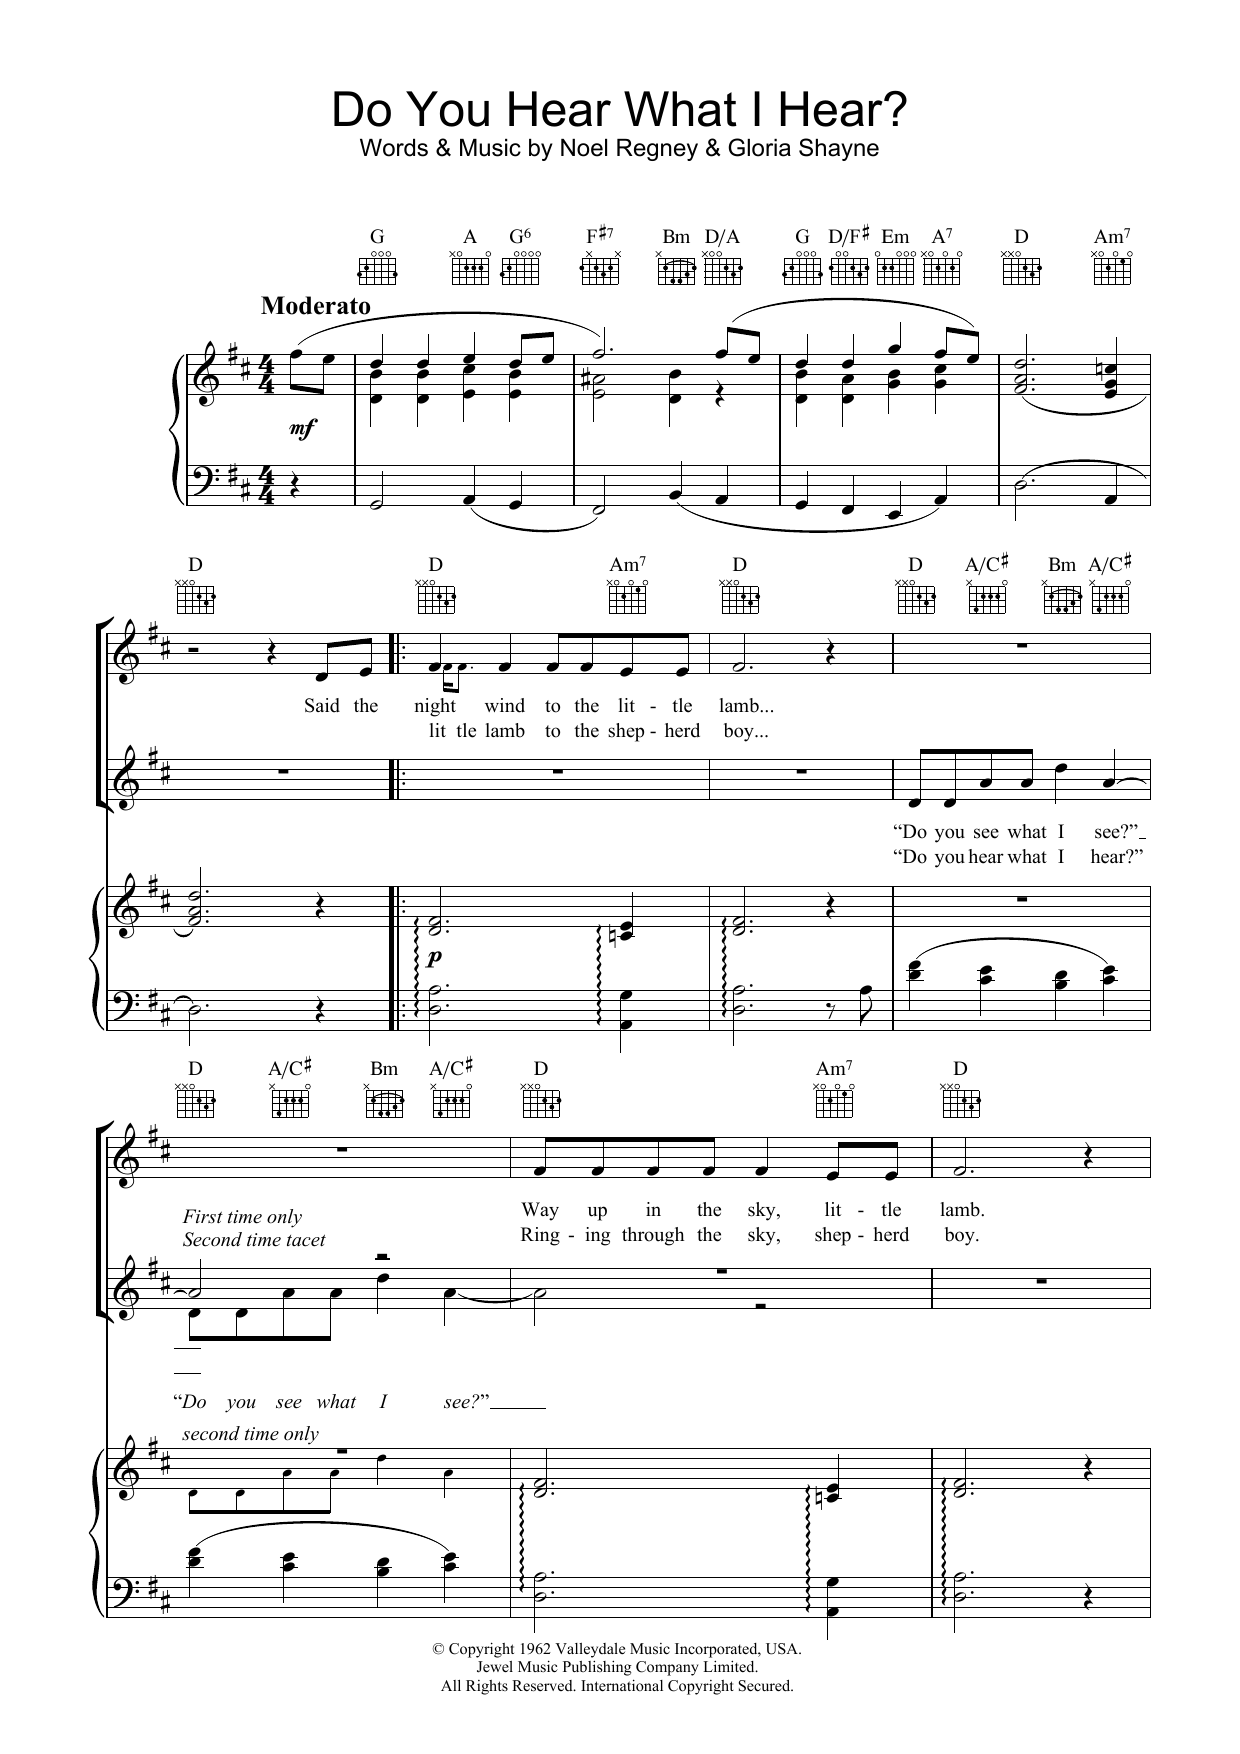 Do You Hear What I Hear? sheet music